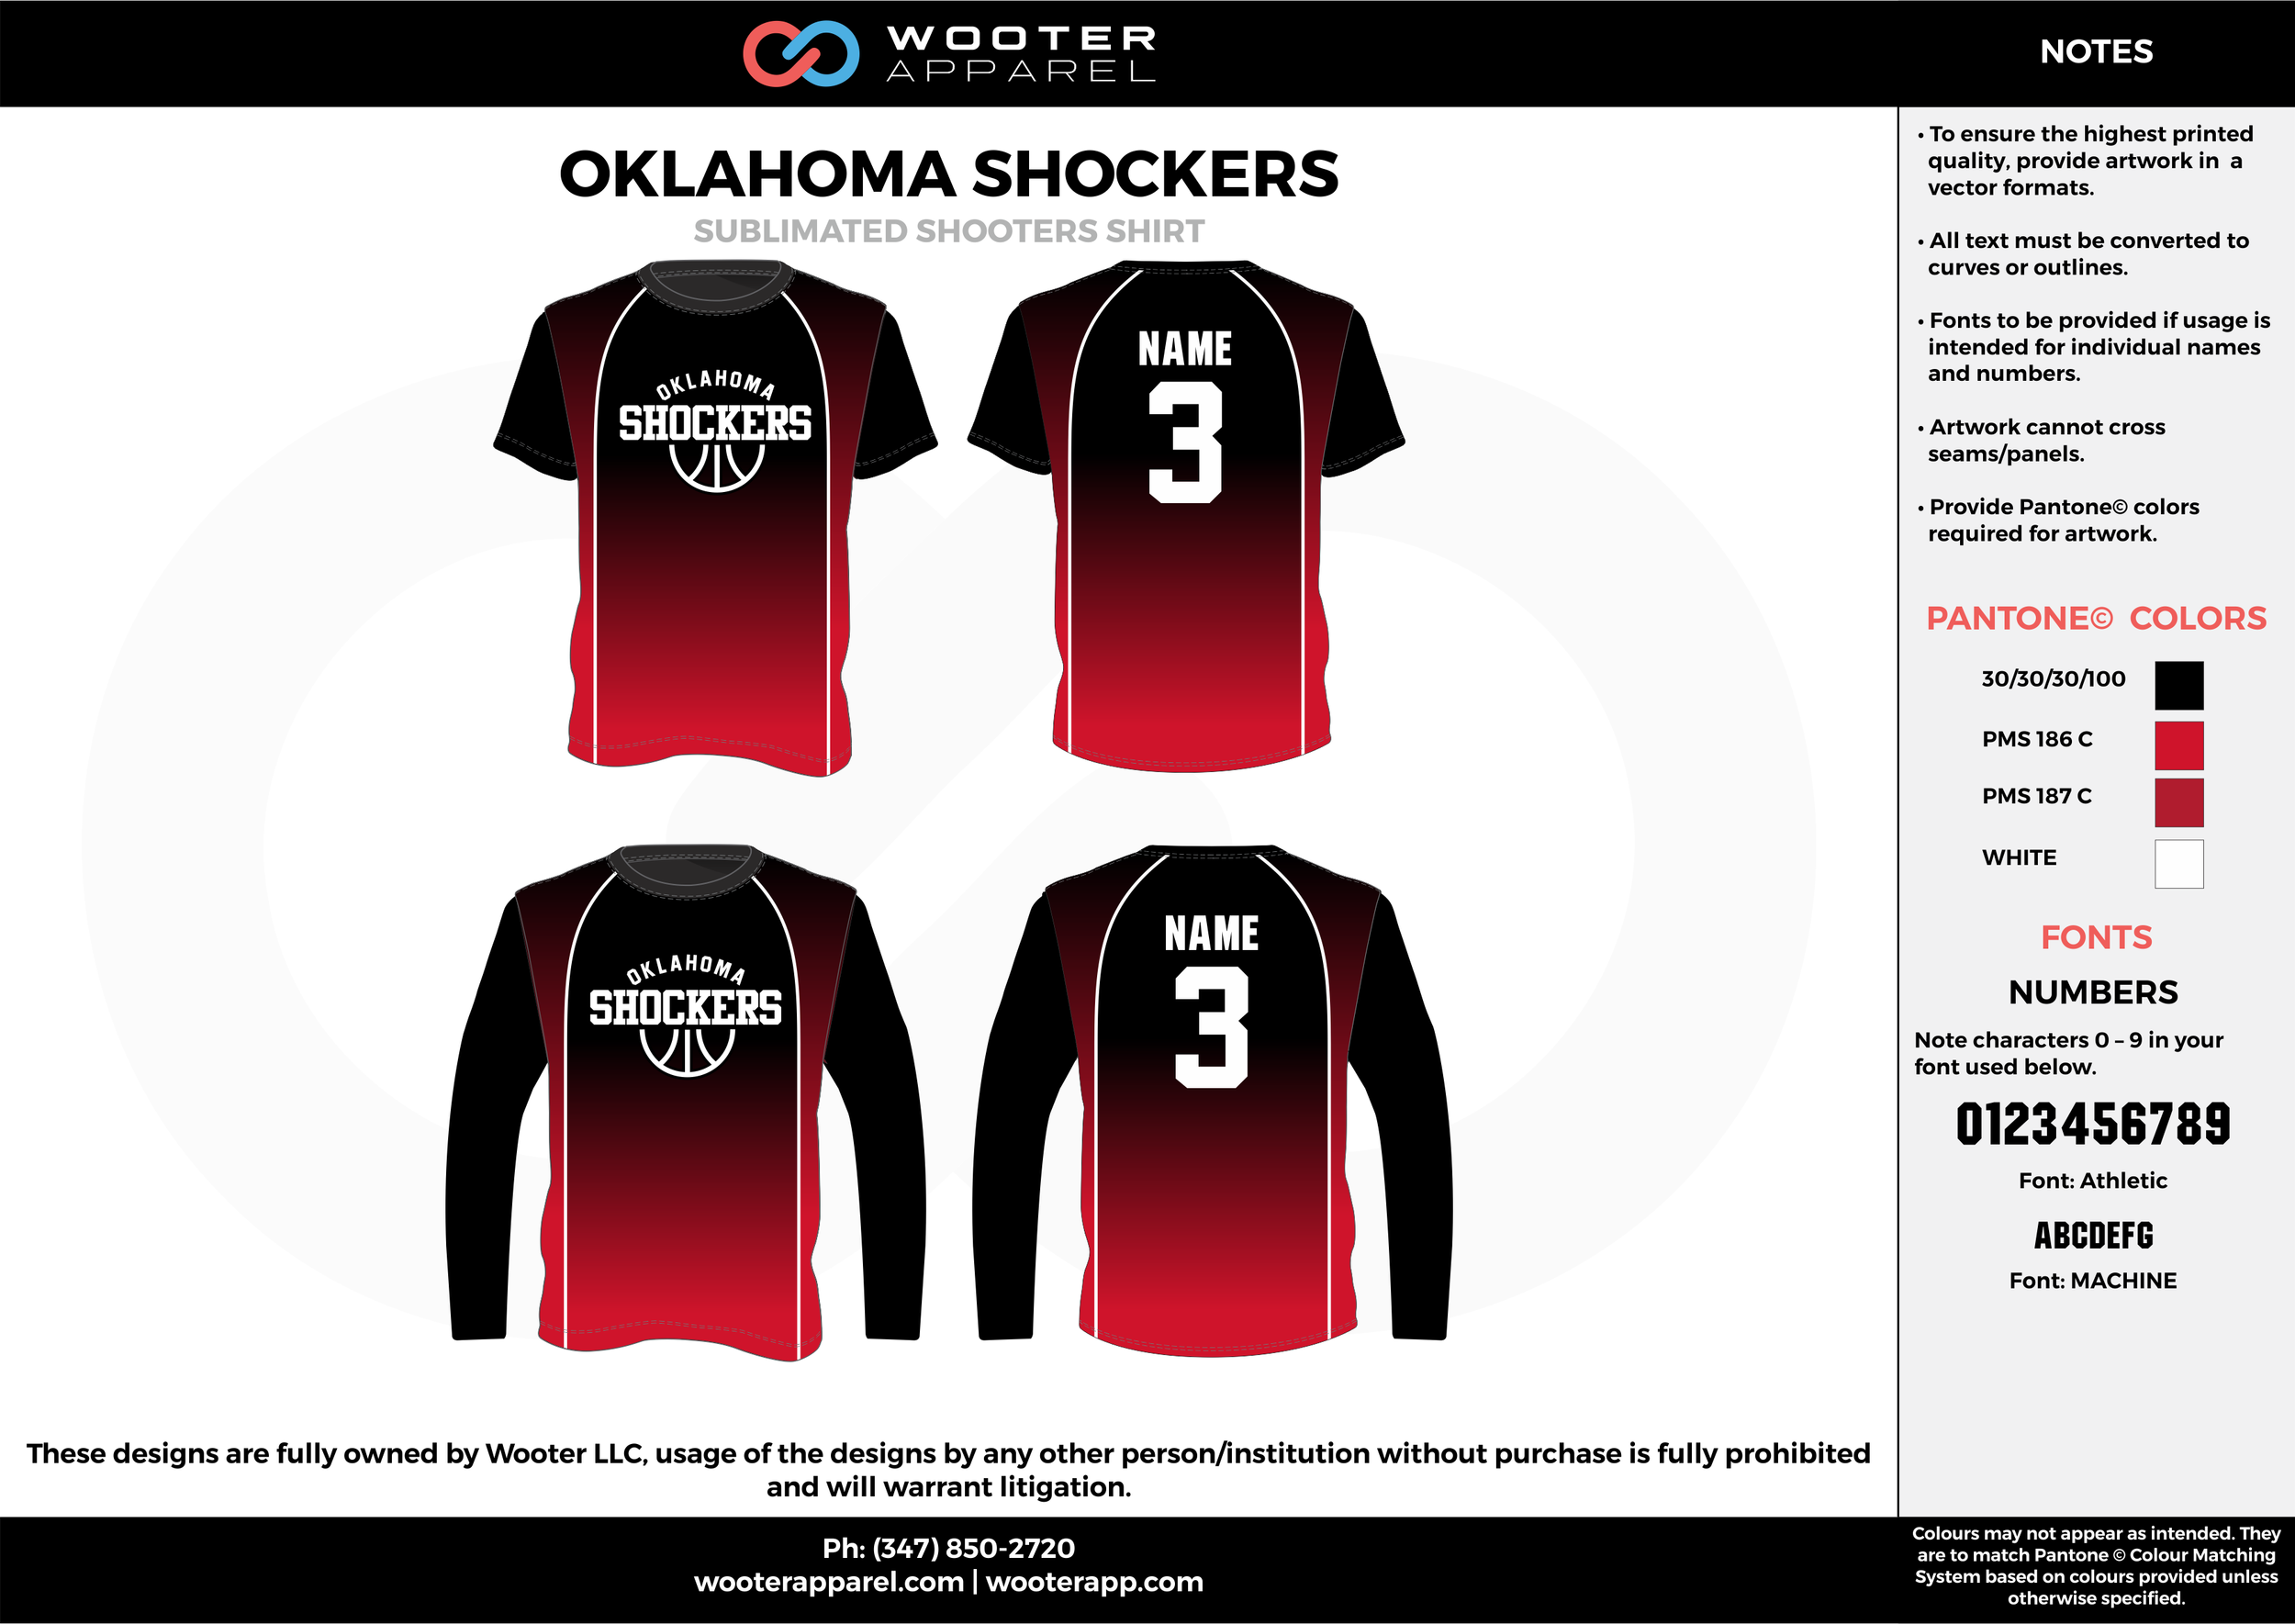 OKLAHOMA SHOCKERS wine red black white Basketball Long Sleeve Shooting Shirt